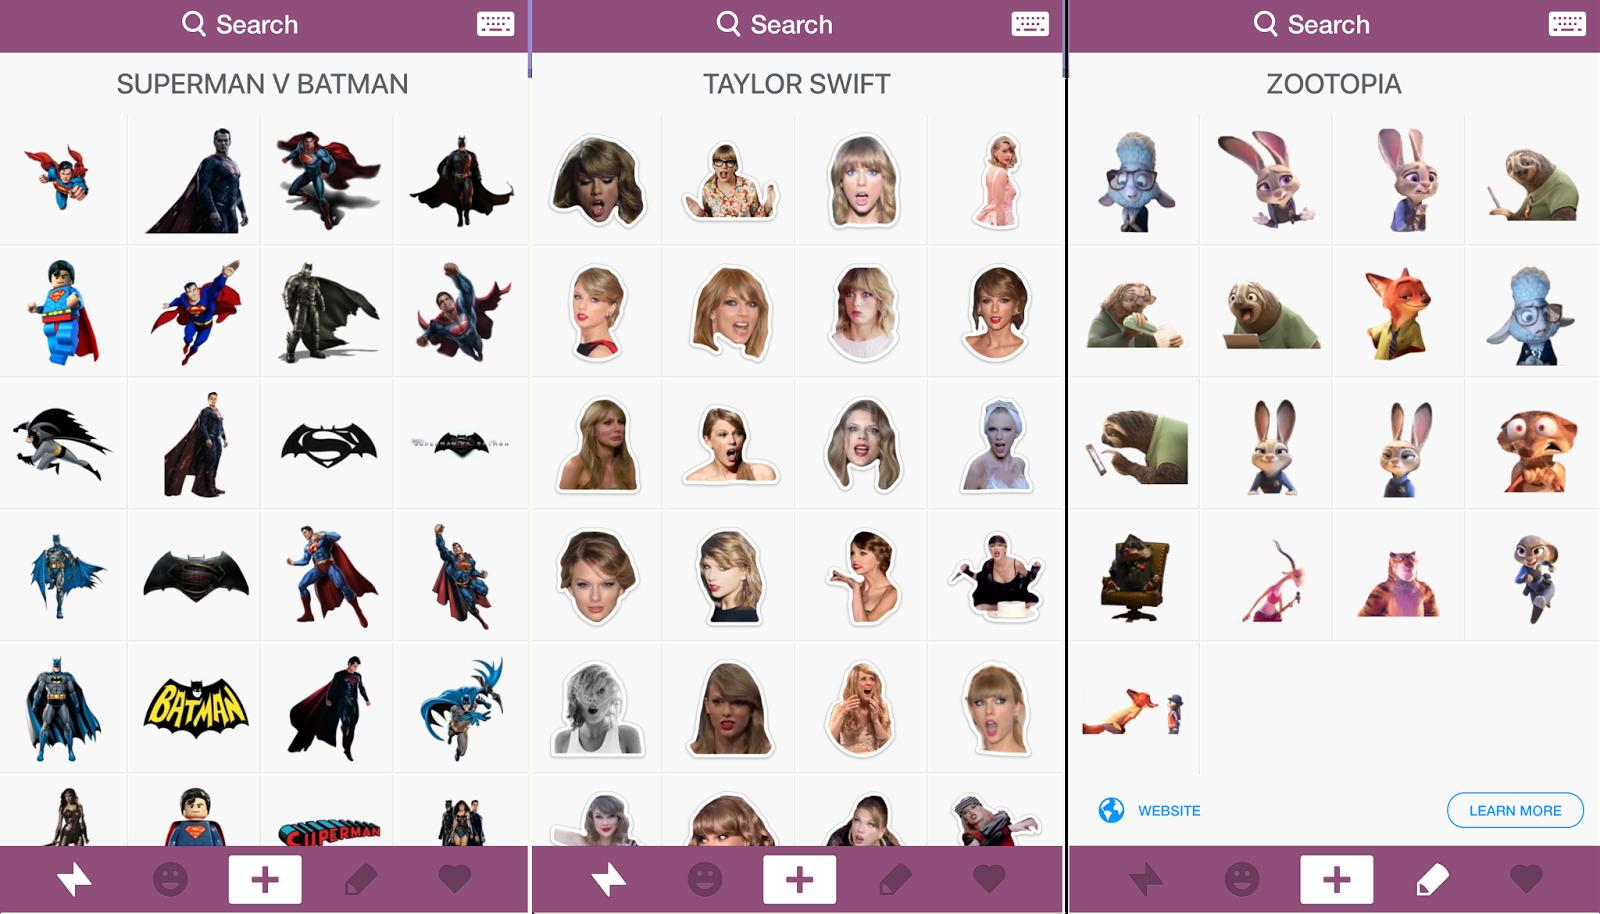 Free Iphone App Imojiapp Create Your Own Emoji